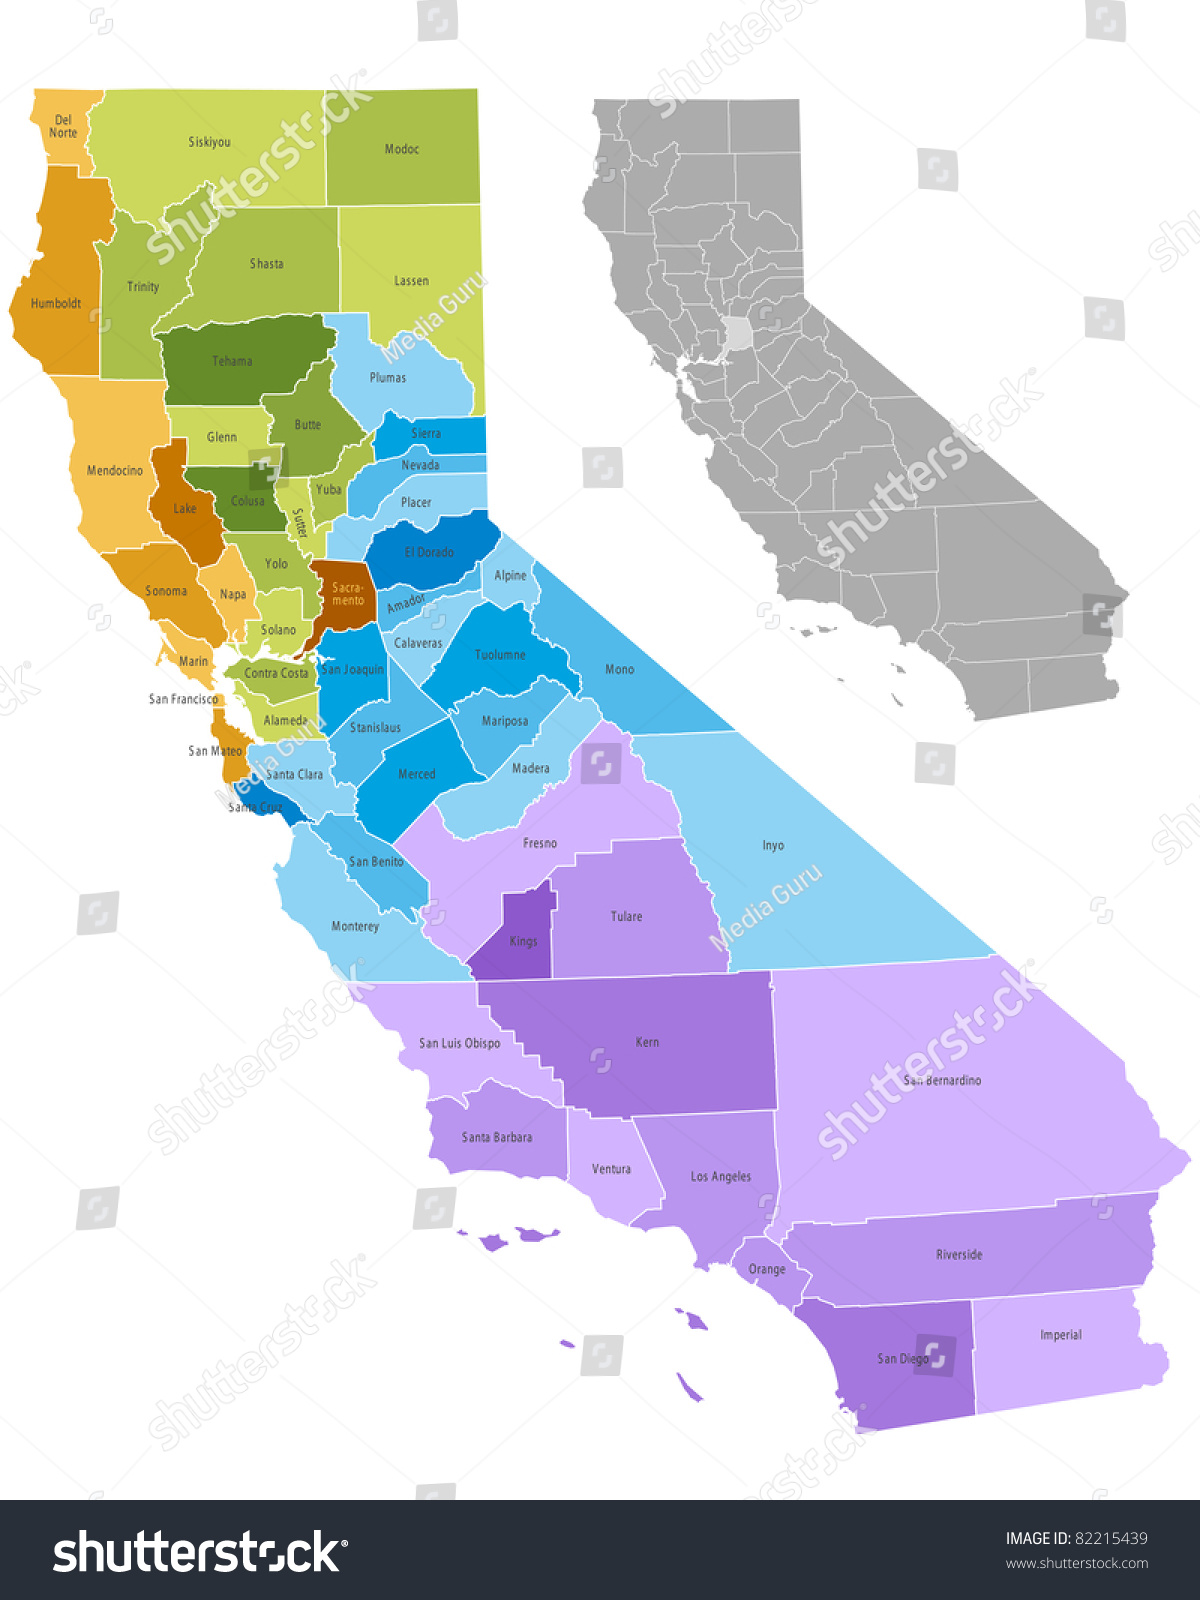 California State Counties Map Boundaries Names Stock Vector - State map california